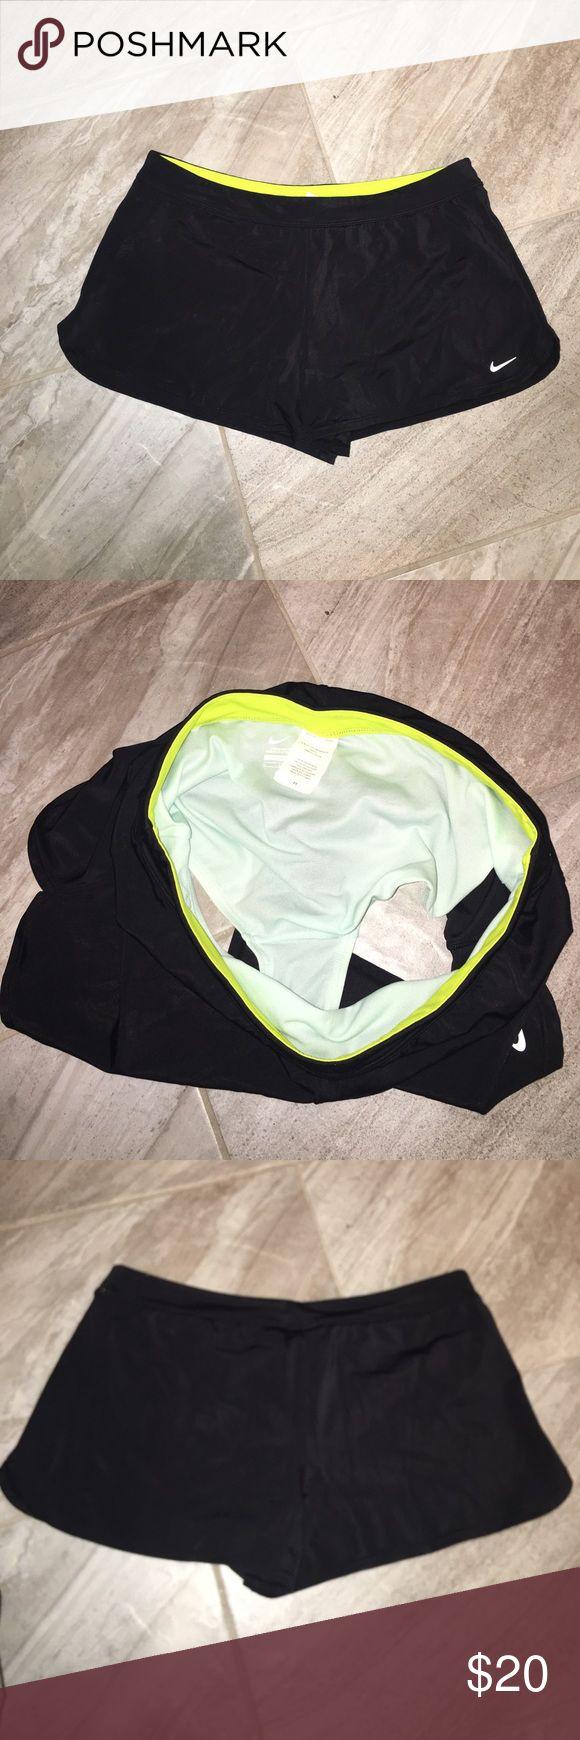 NIKE DRI FIT SHORTS NIKE DRI FIT SHORTS Built in underwear. super cute Sz MED Nike Shorts Skorts